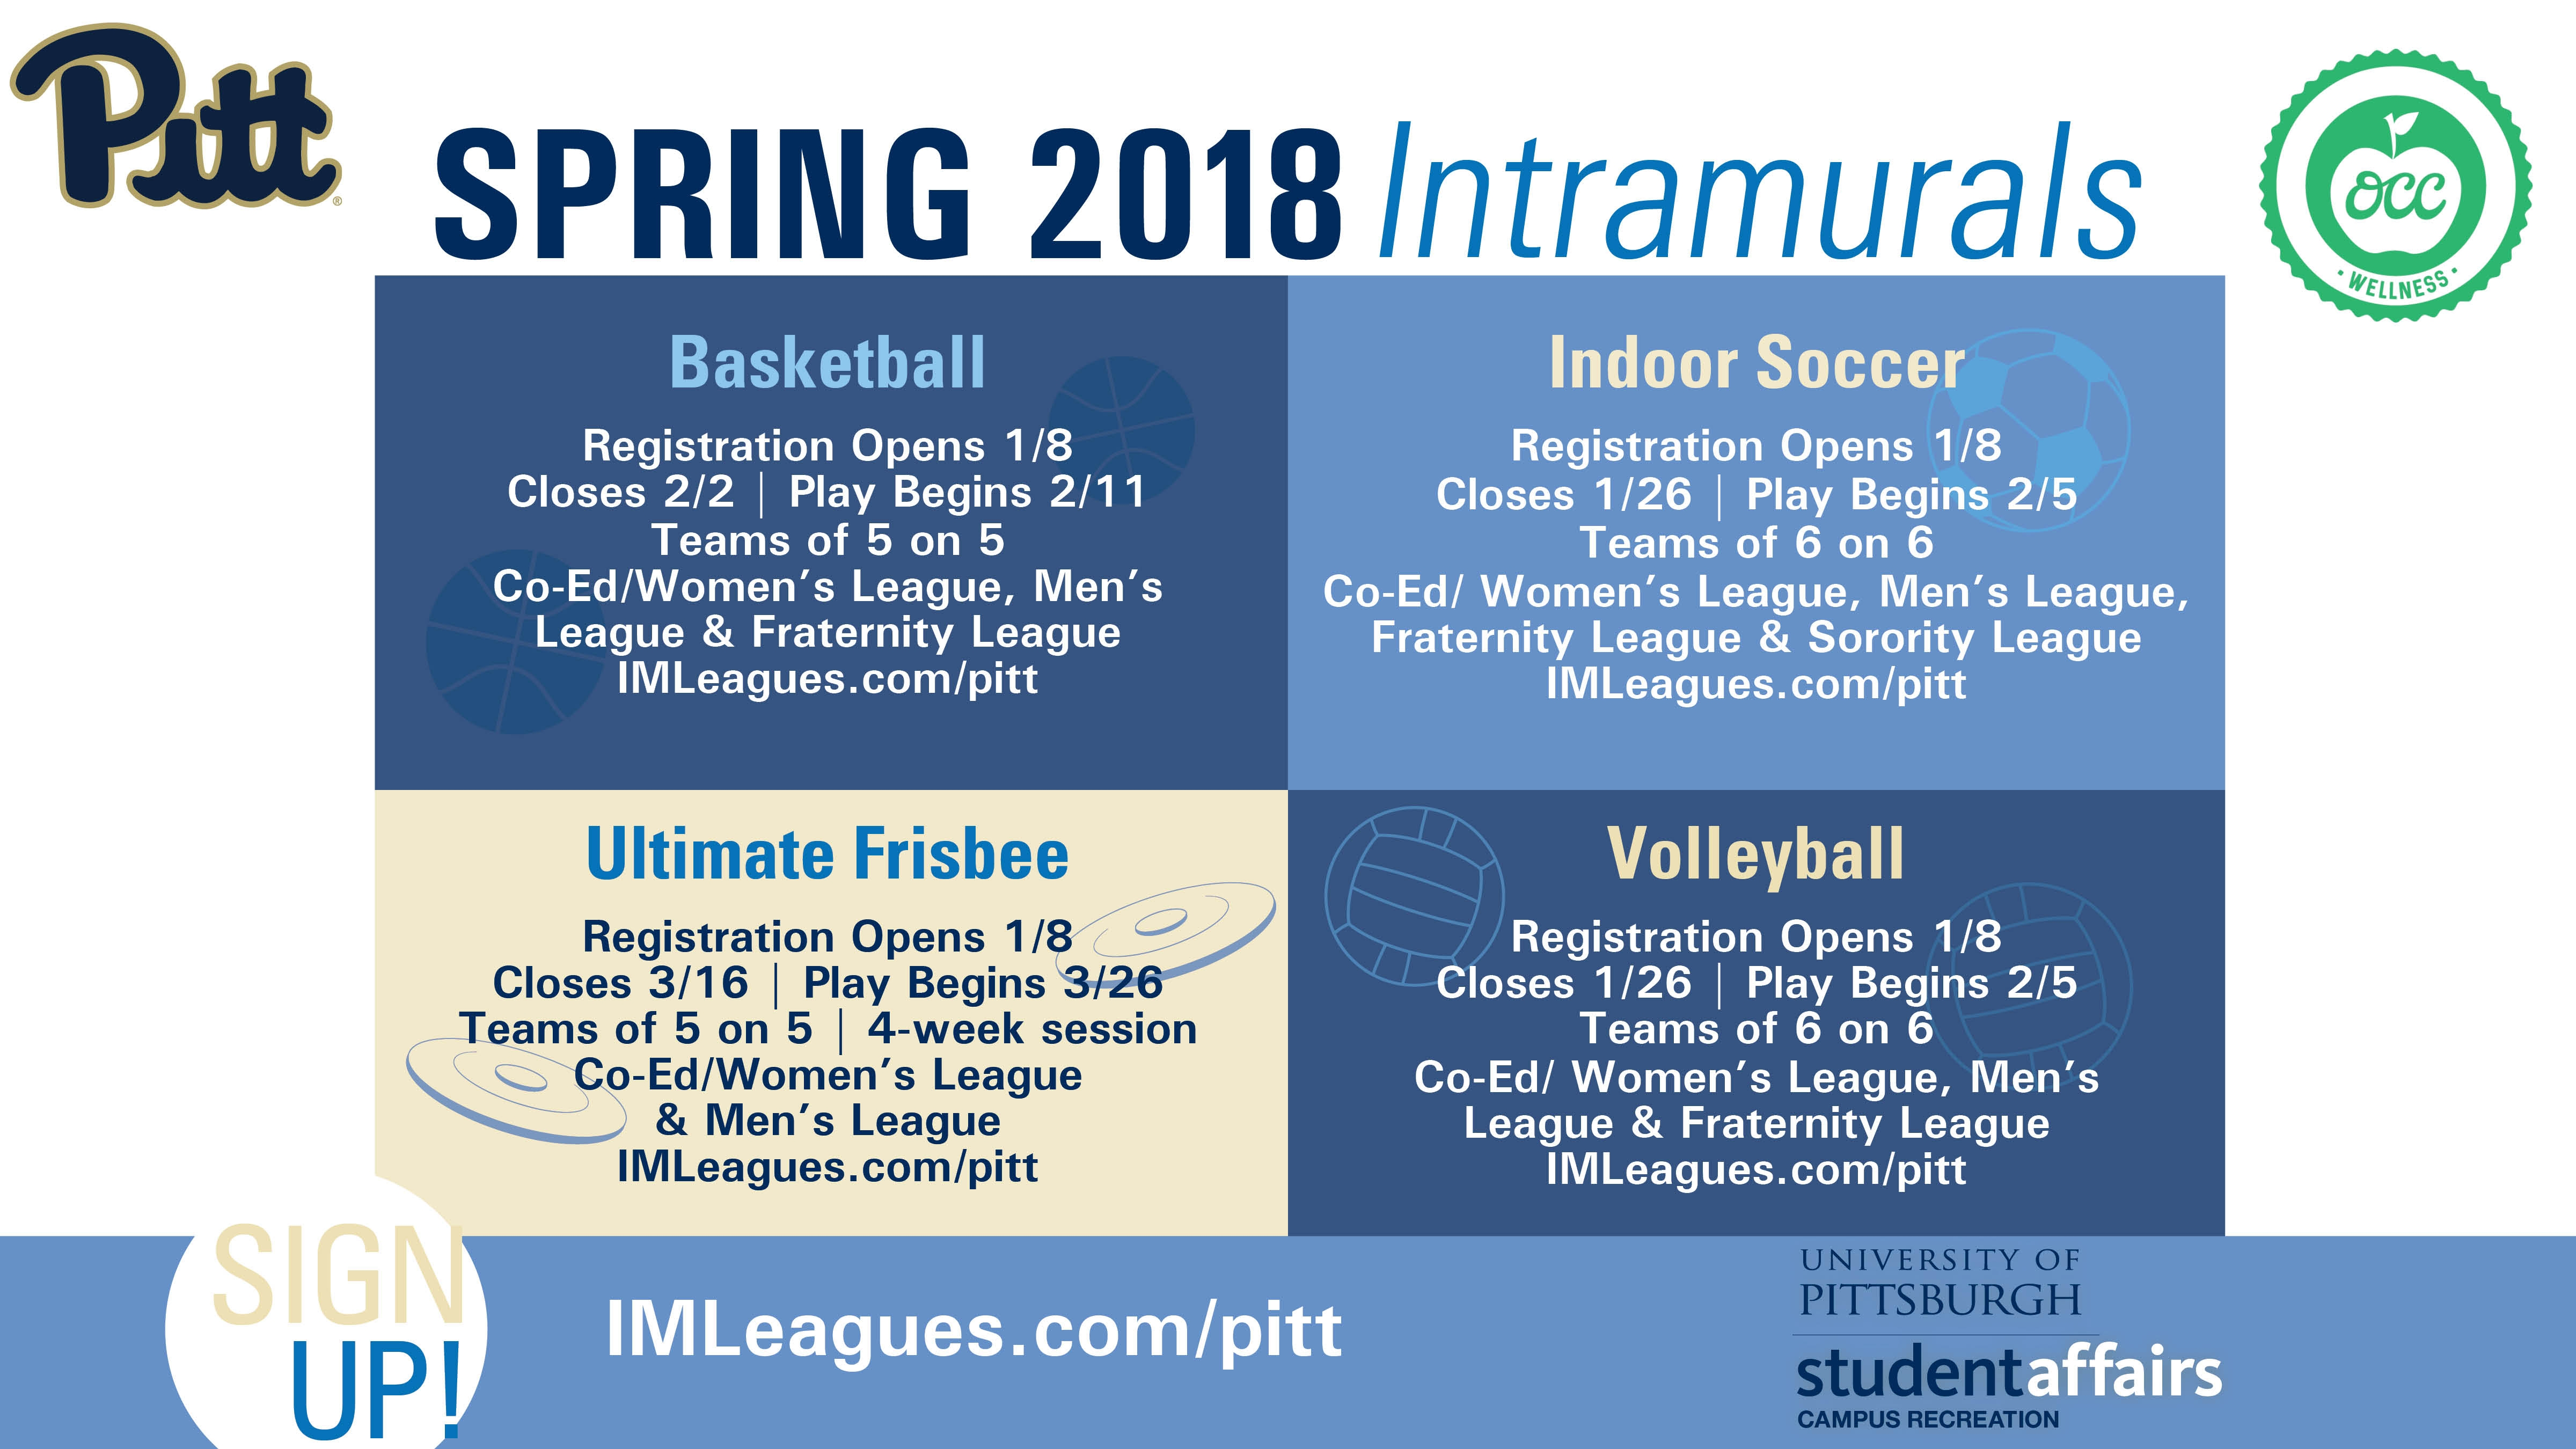 Intramurals_Spring18_Slide_clean_March 16